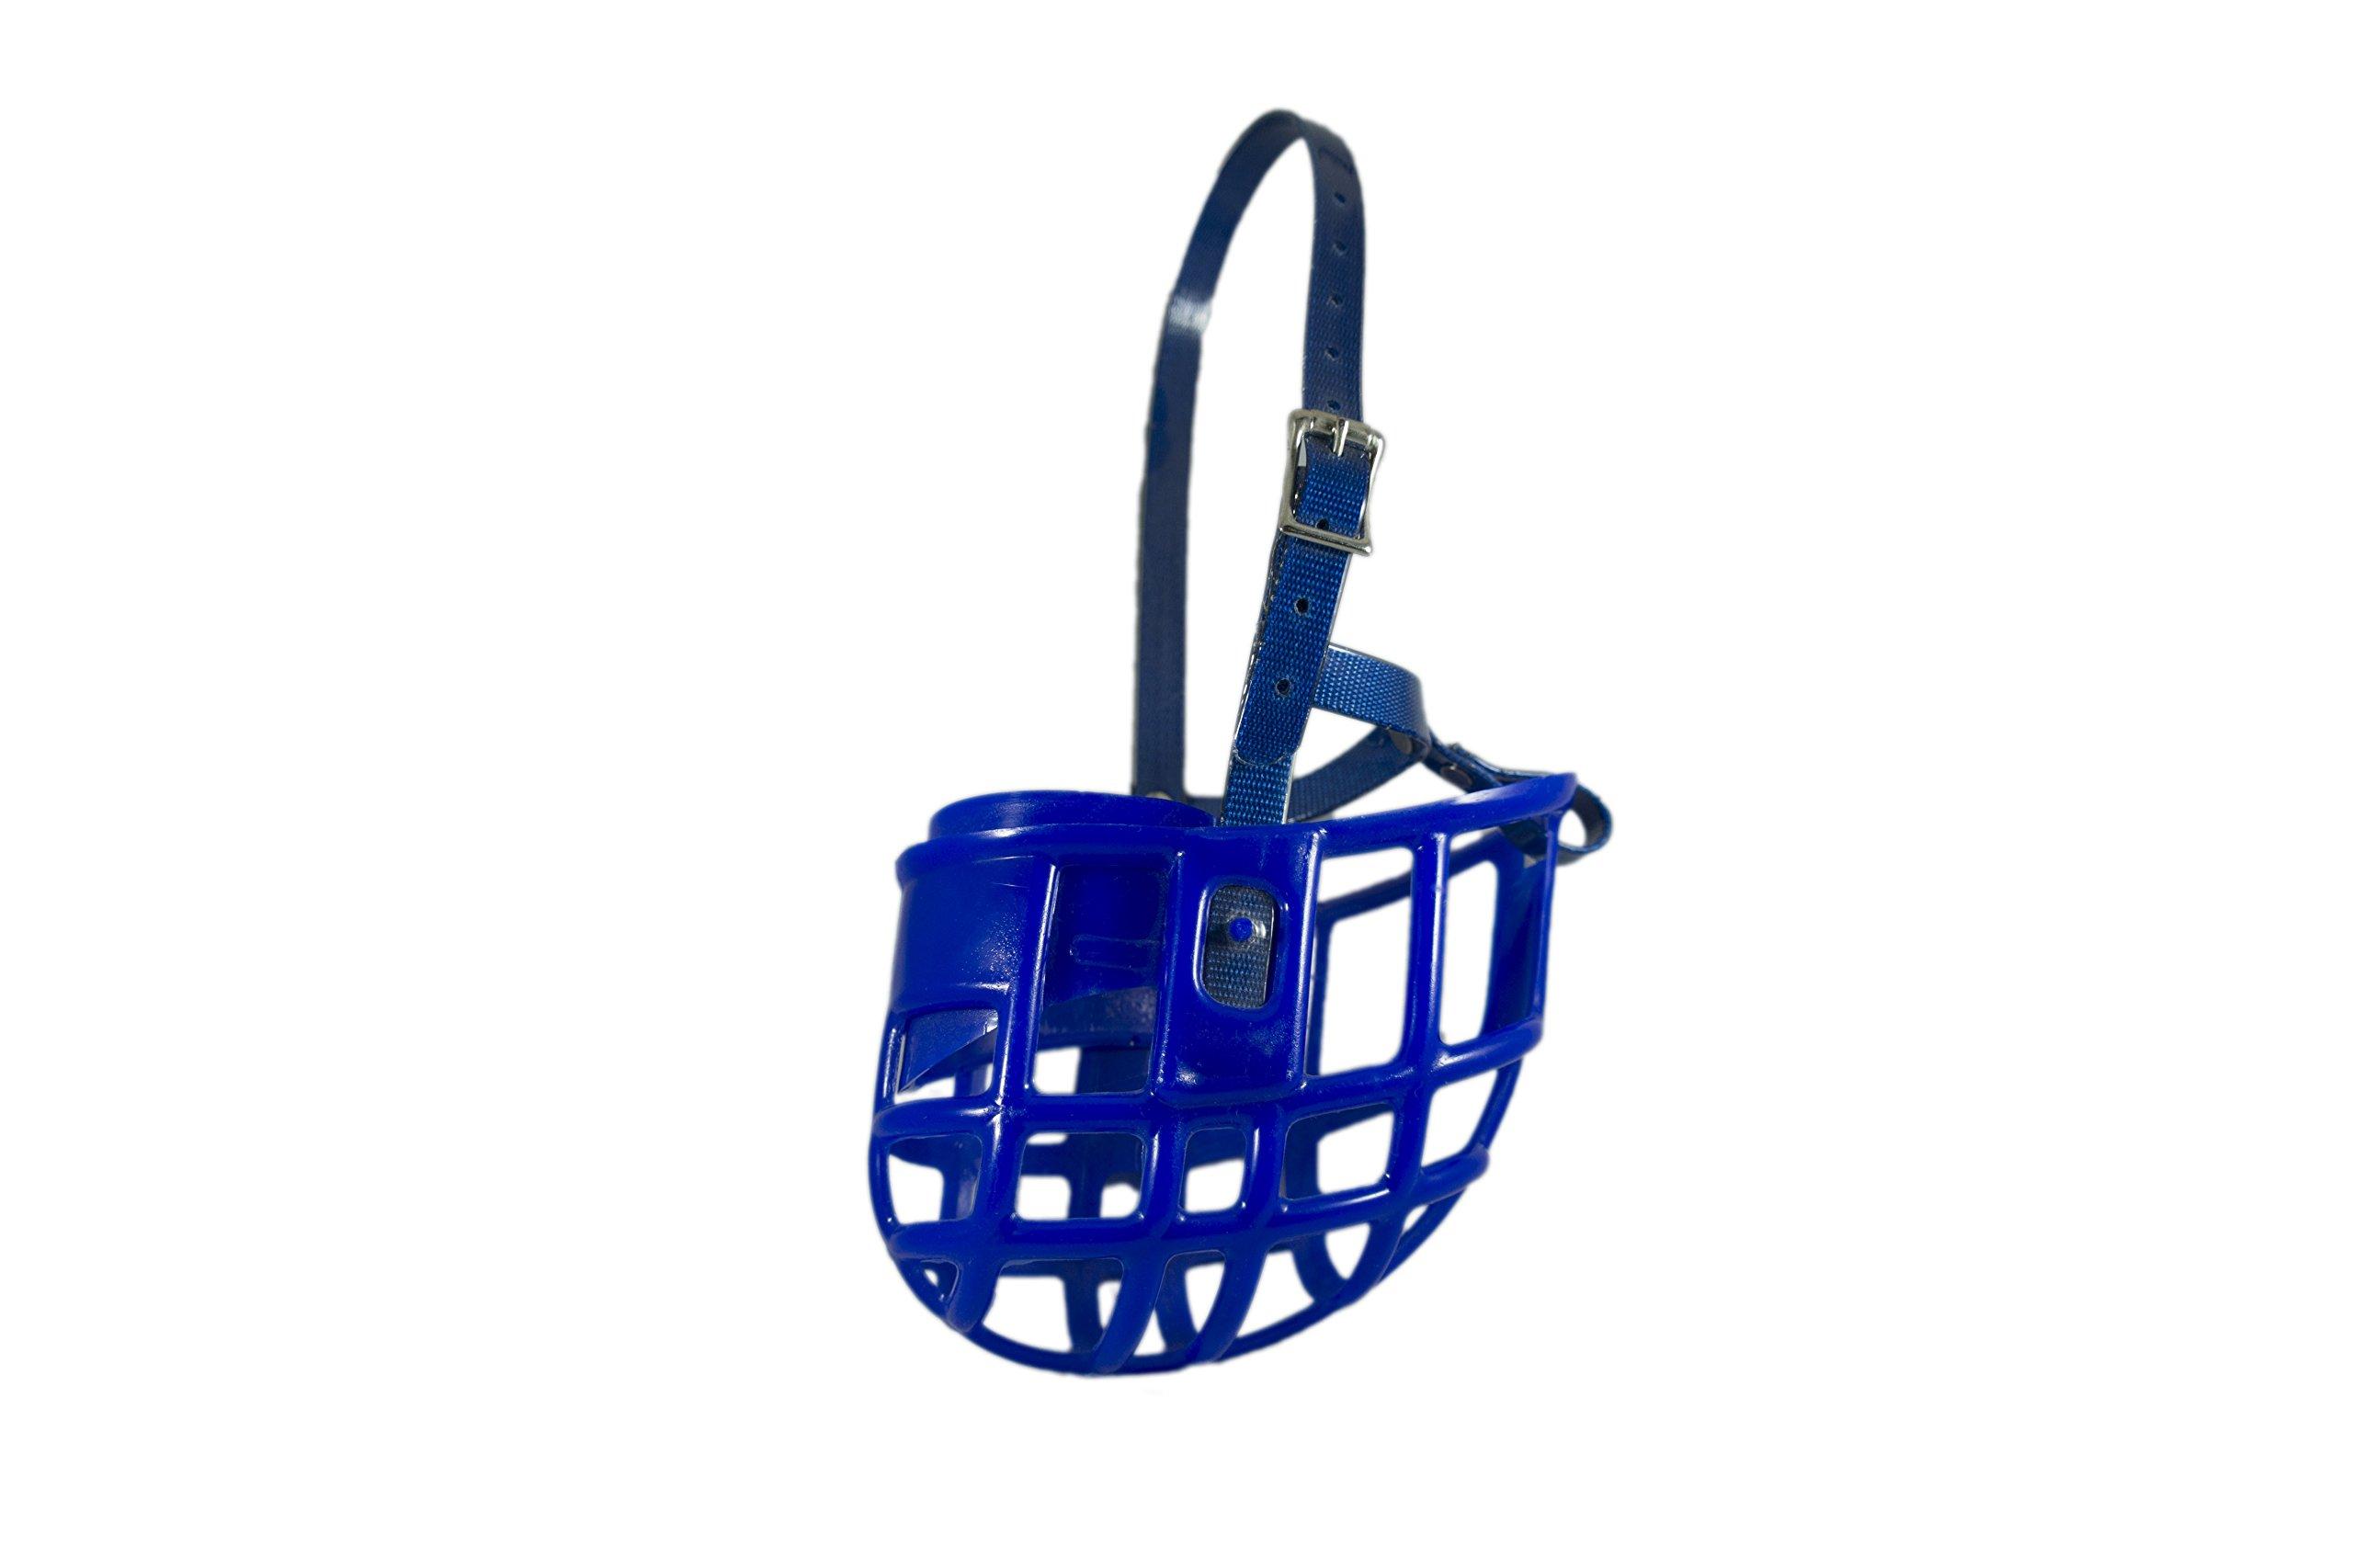 Birdwell Enterprises - Plastic Dog Muzzle with adjustable plastic coated Nylon headstall - Made in the USA - (Large, Blue)